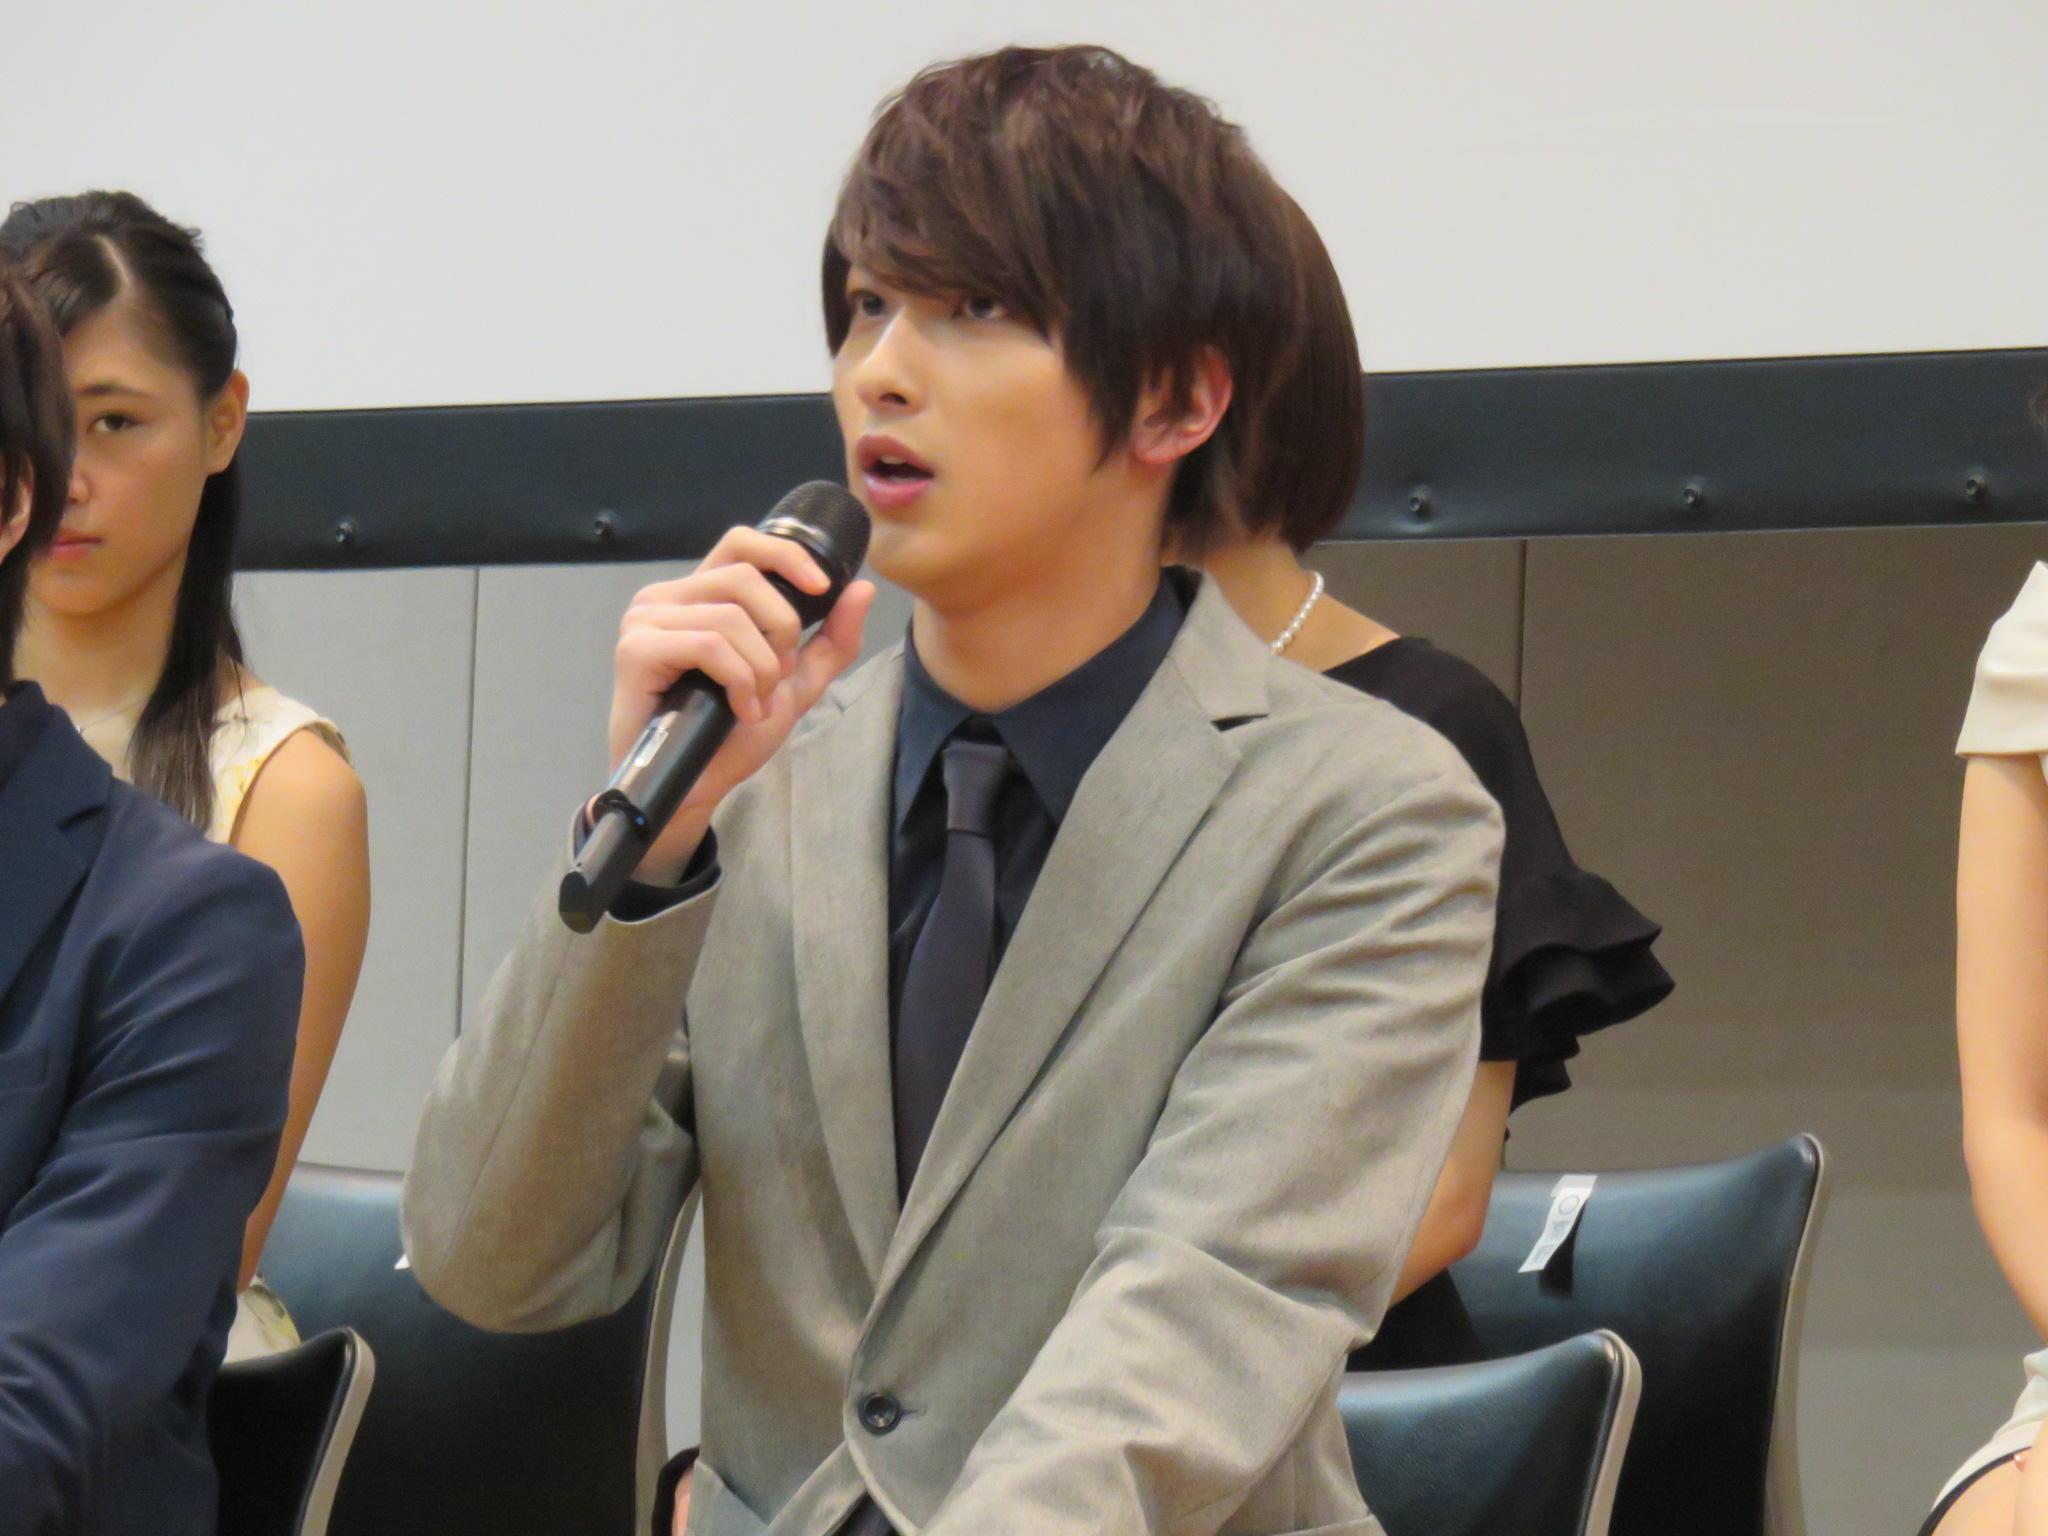 http://news.yoshimoto.co.jp/20161130210523-a8222e41b794c49722f8cd0303fd0872269a38f2.jpg